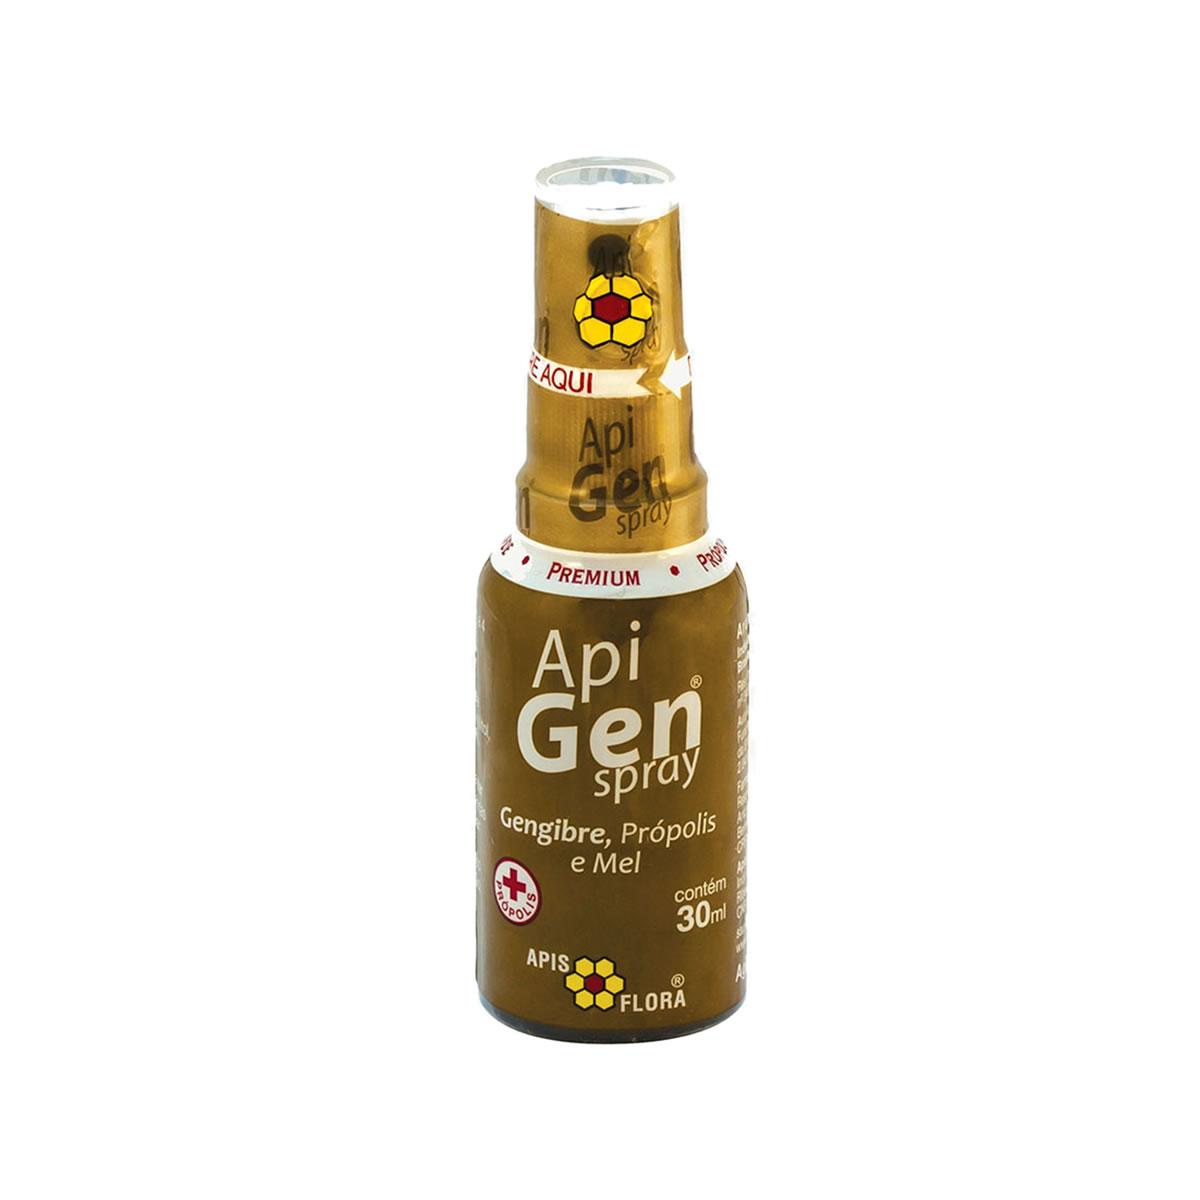 Apigen Spray sabor Gengibre 30ml - Apis Flora